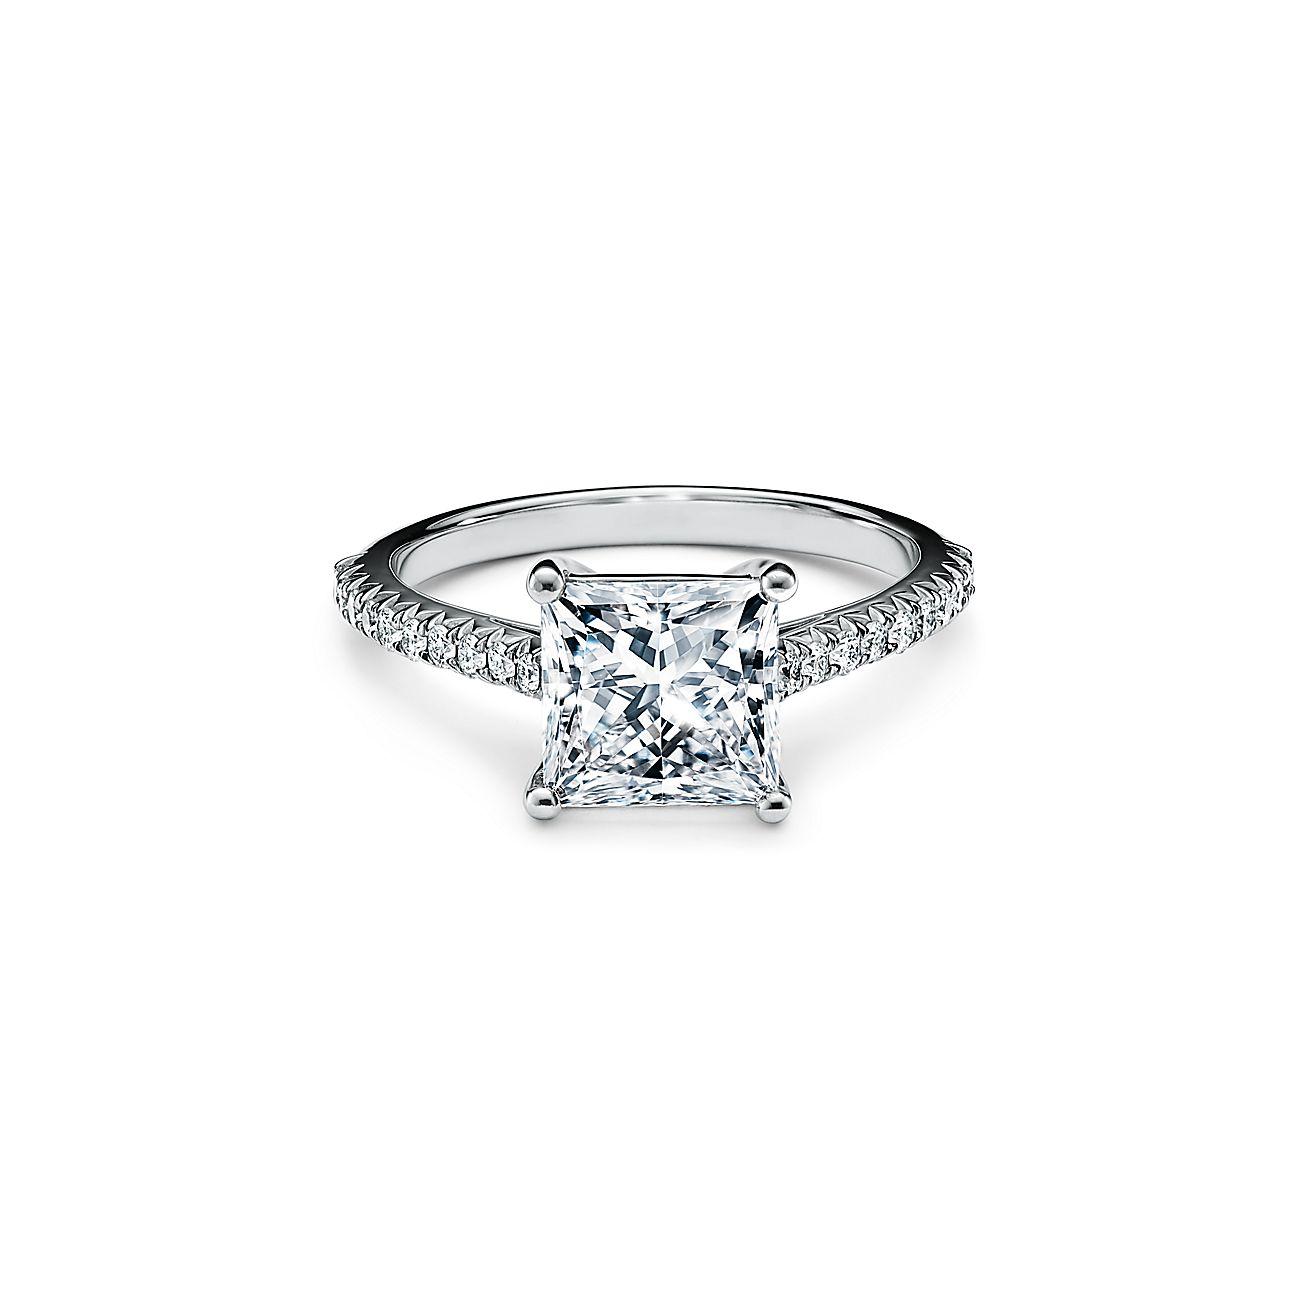 Tiffany Novo Princess Cut Engagement Ring With A Pave Set